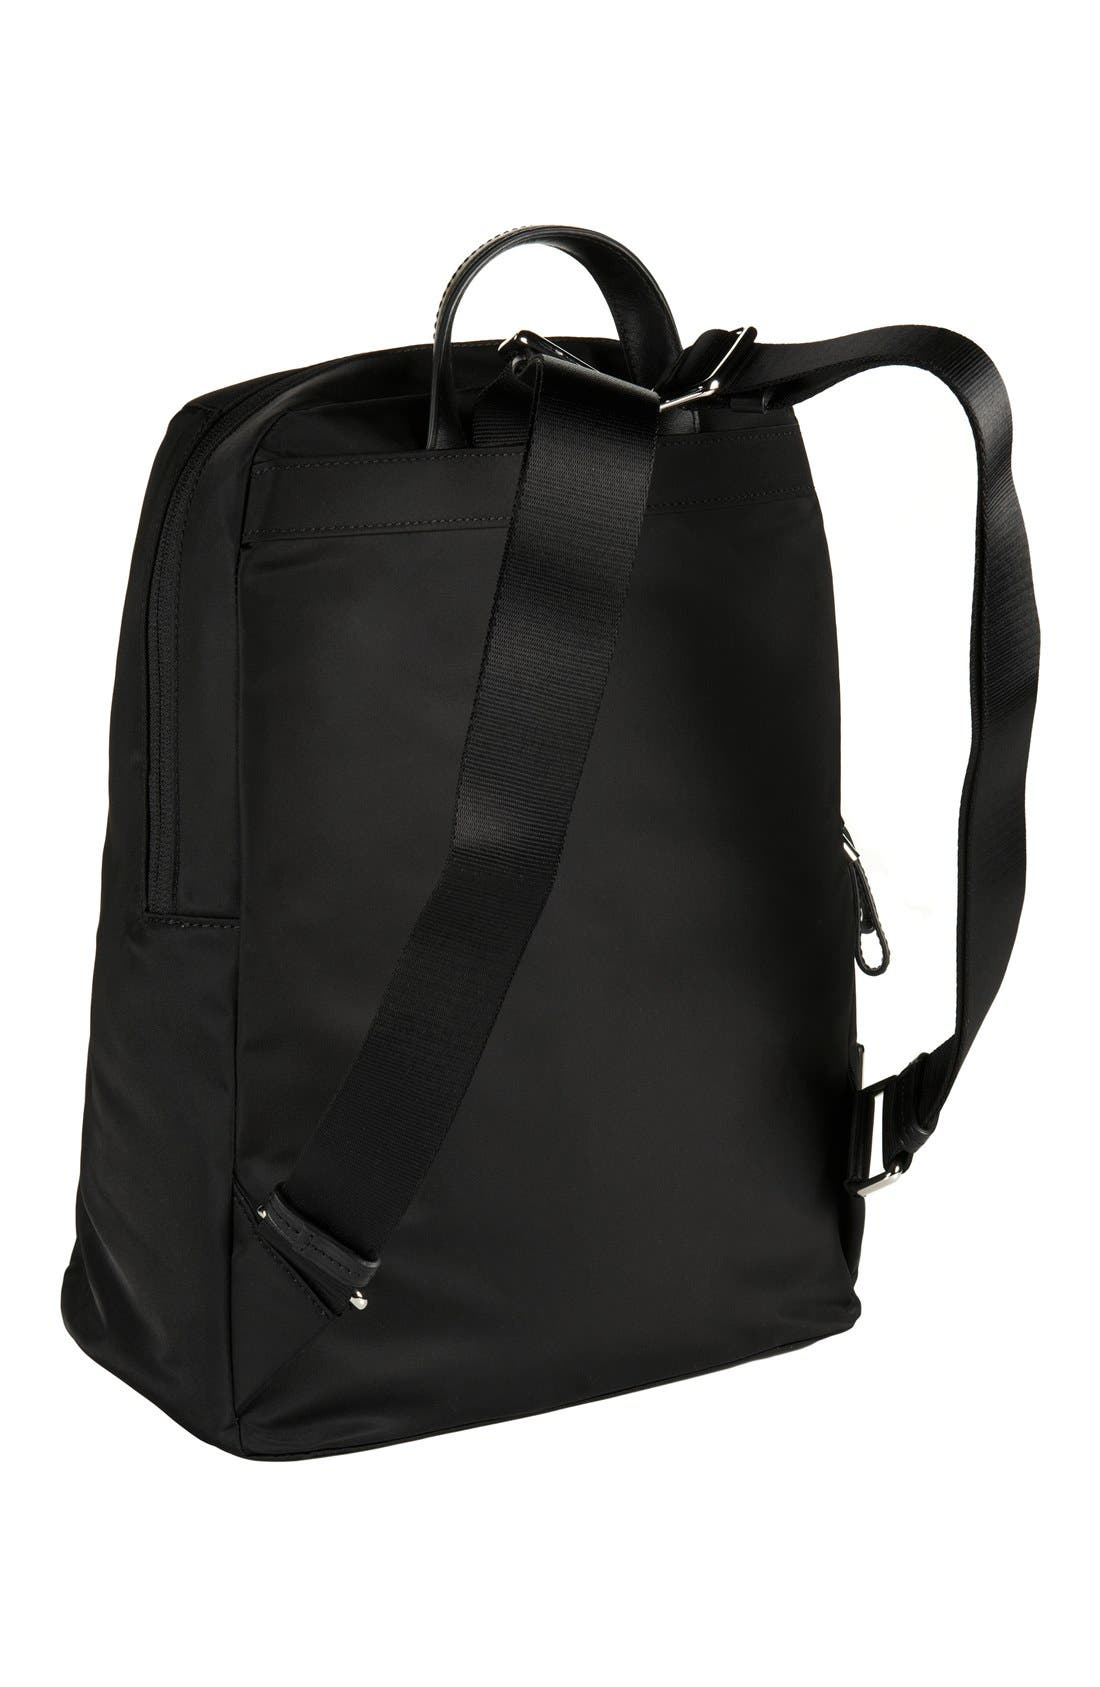 Alternate Image 3  - Tumi 'Voyageur Halle' Nylon Backpack